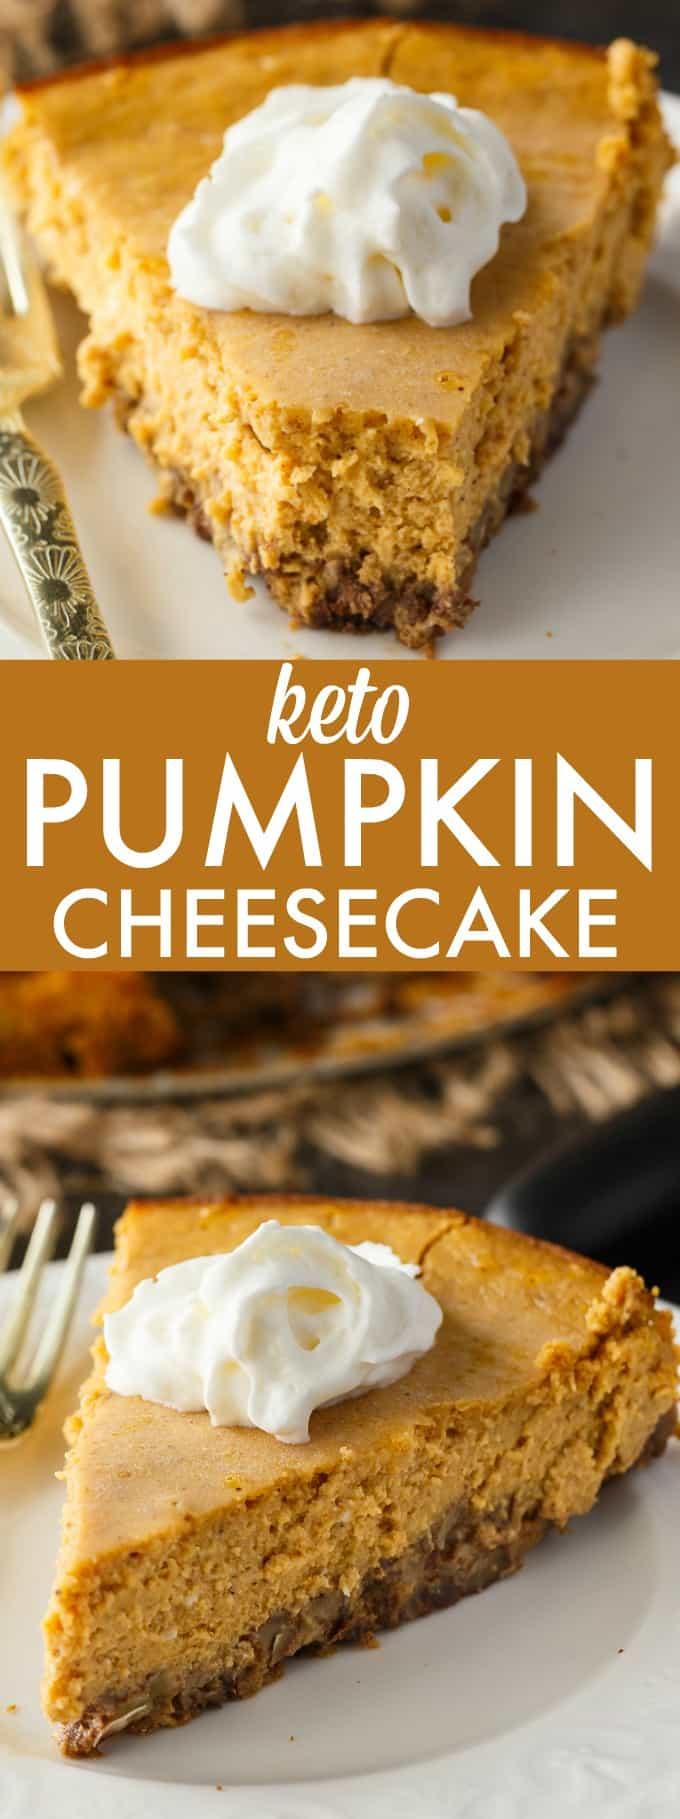 Keto Dessert Cheesecake  Keto Pumpkin Cheesecake Simply Stacie